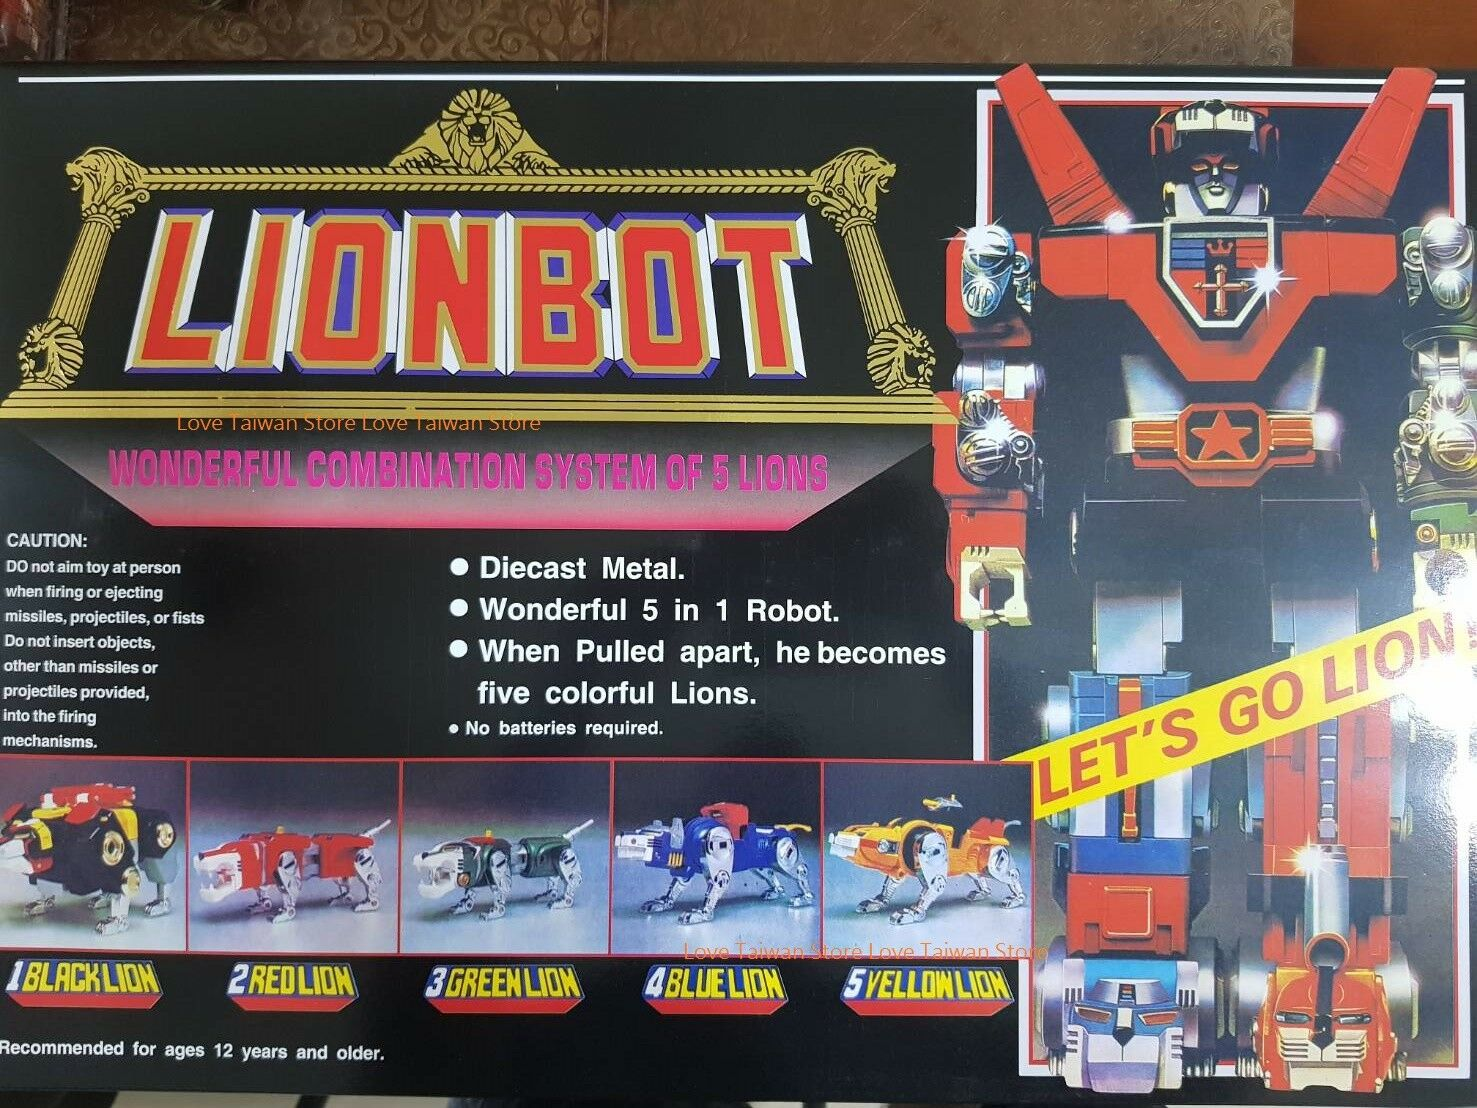 DHL Navy - New lionbot (Taiwan Edition) 1980 chogokin metal fundido 5,1 Robot